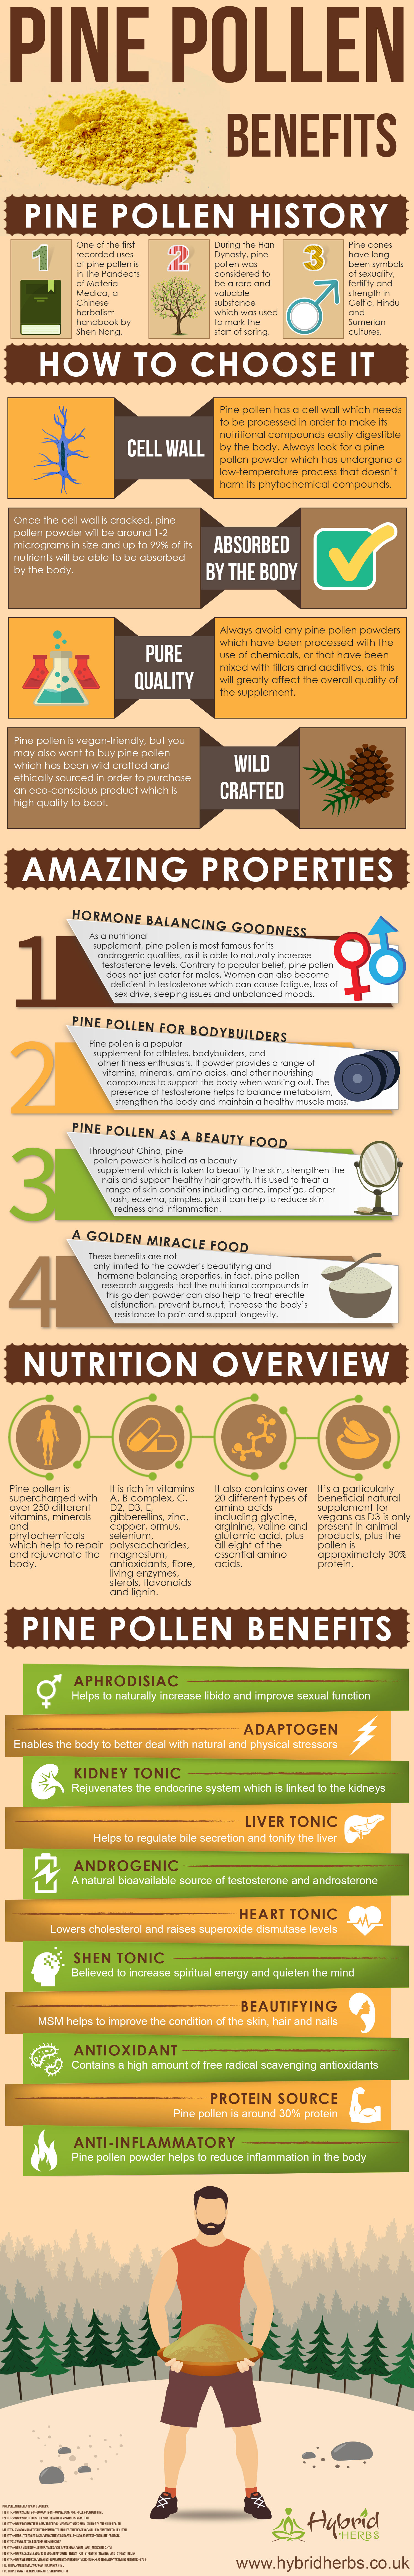 pine-pollen-health-benefits.jpg